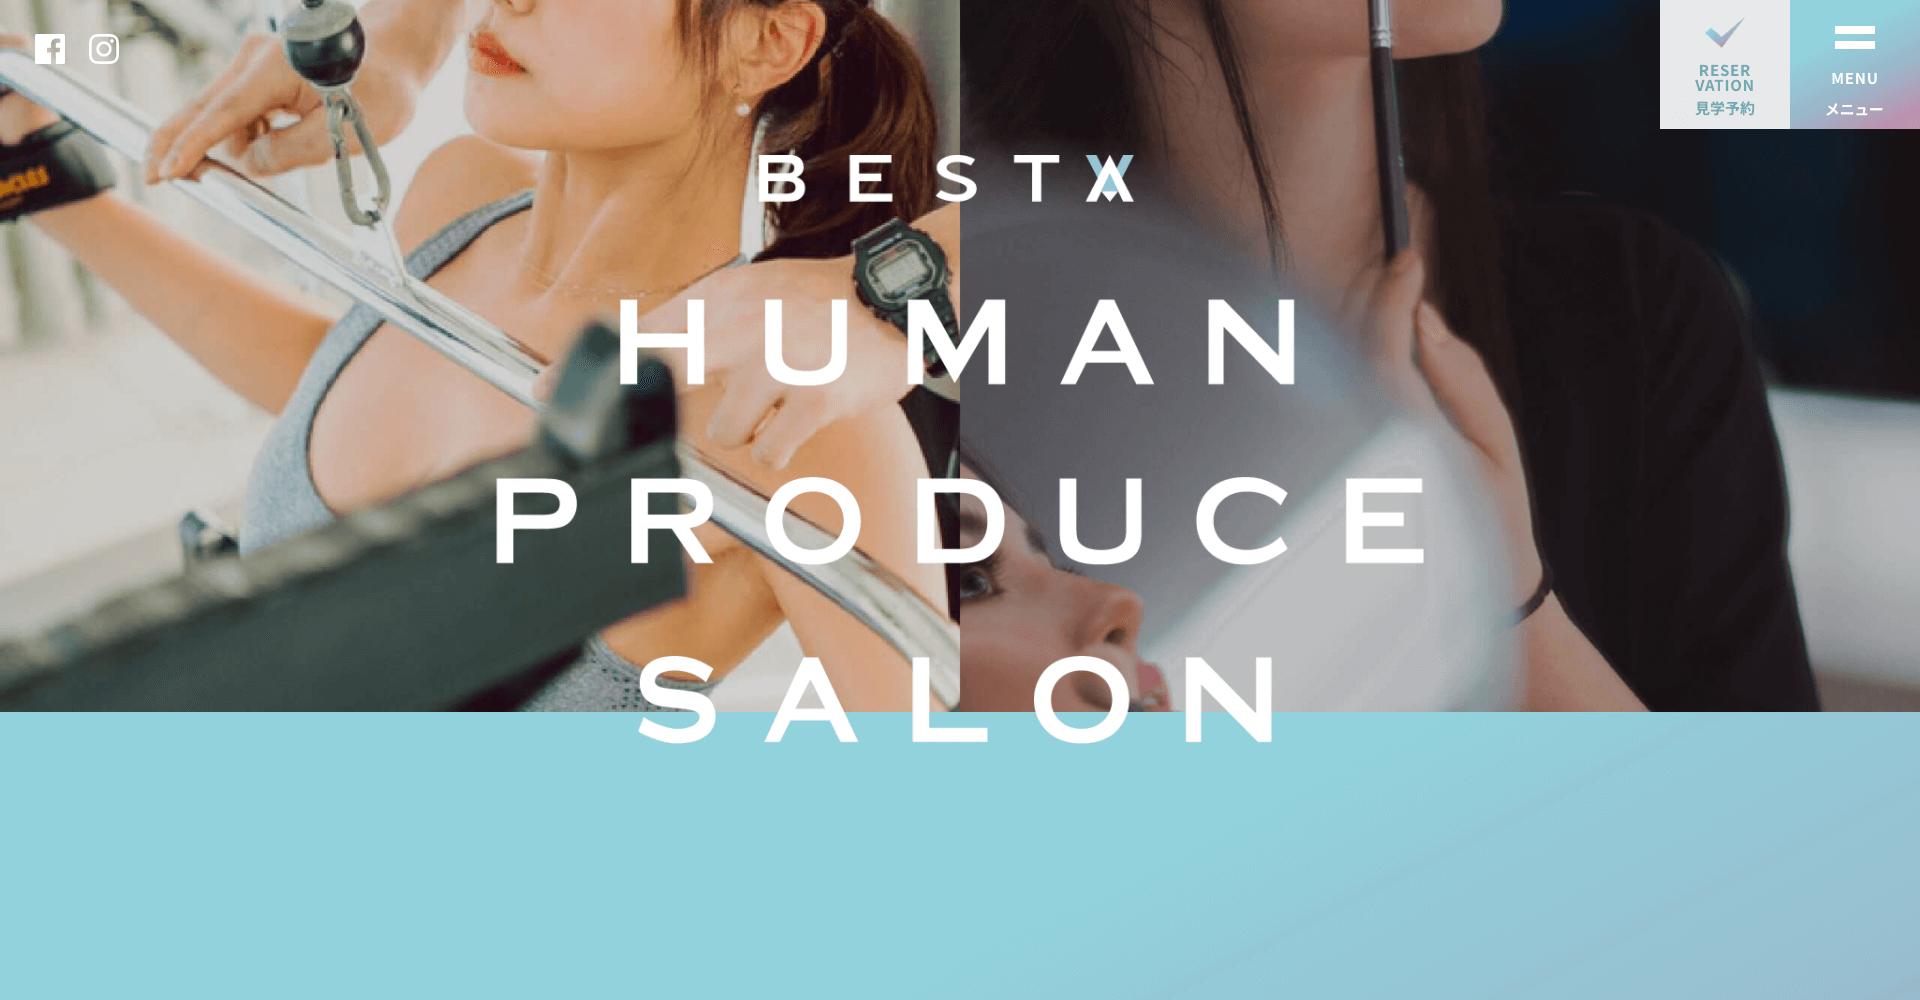 HumanProduceSalonBESTA(ビスタ)恵比寿店